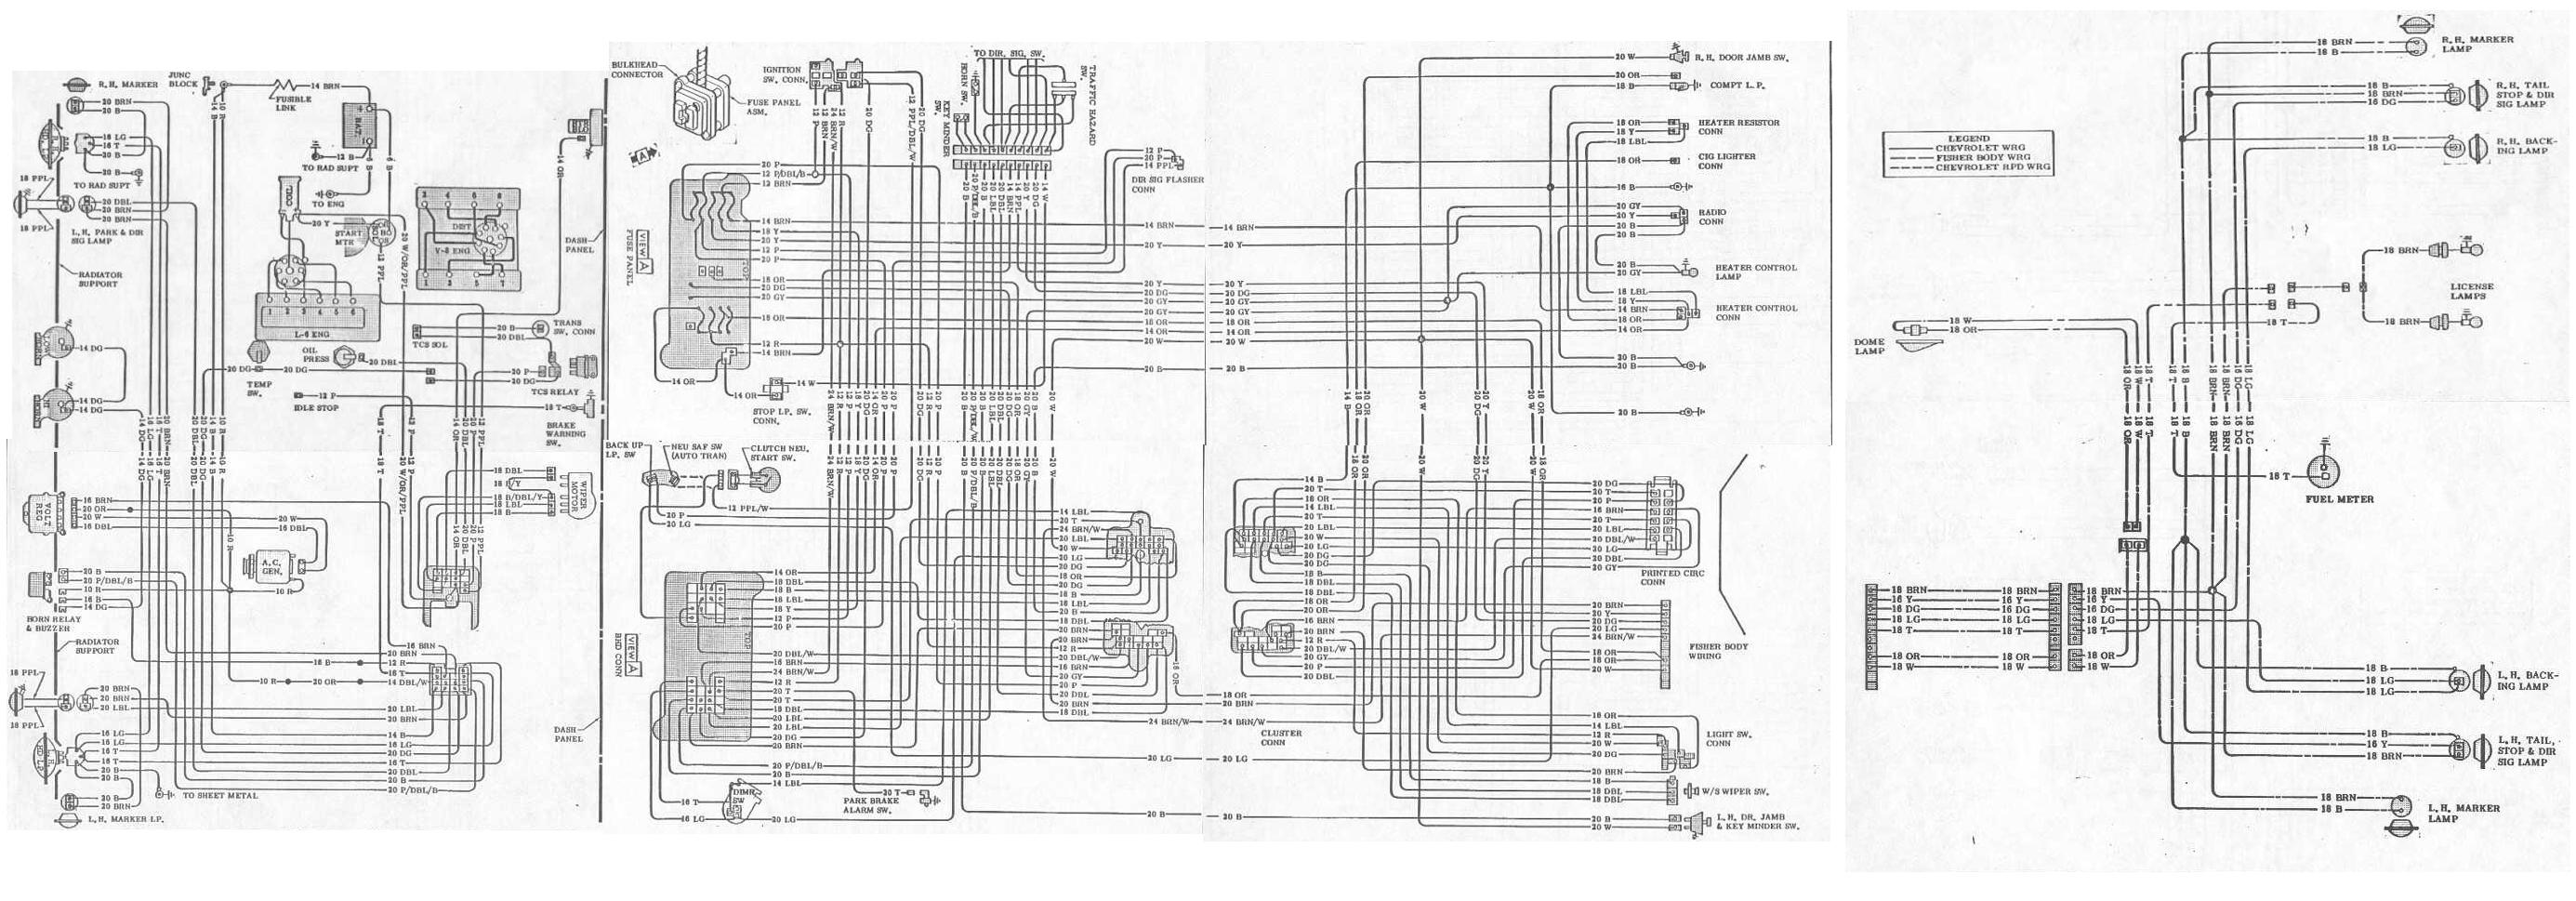 69 firebird wiring diagram 96 civic ignition switch 1973 pontiac harness get free image